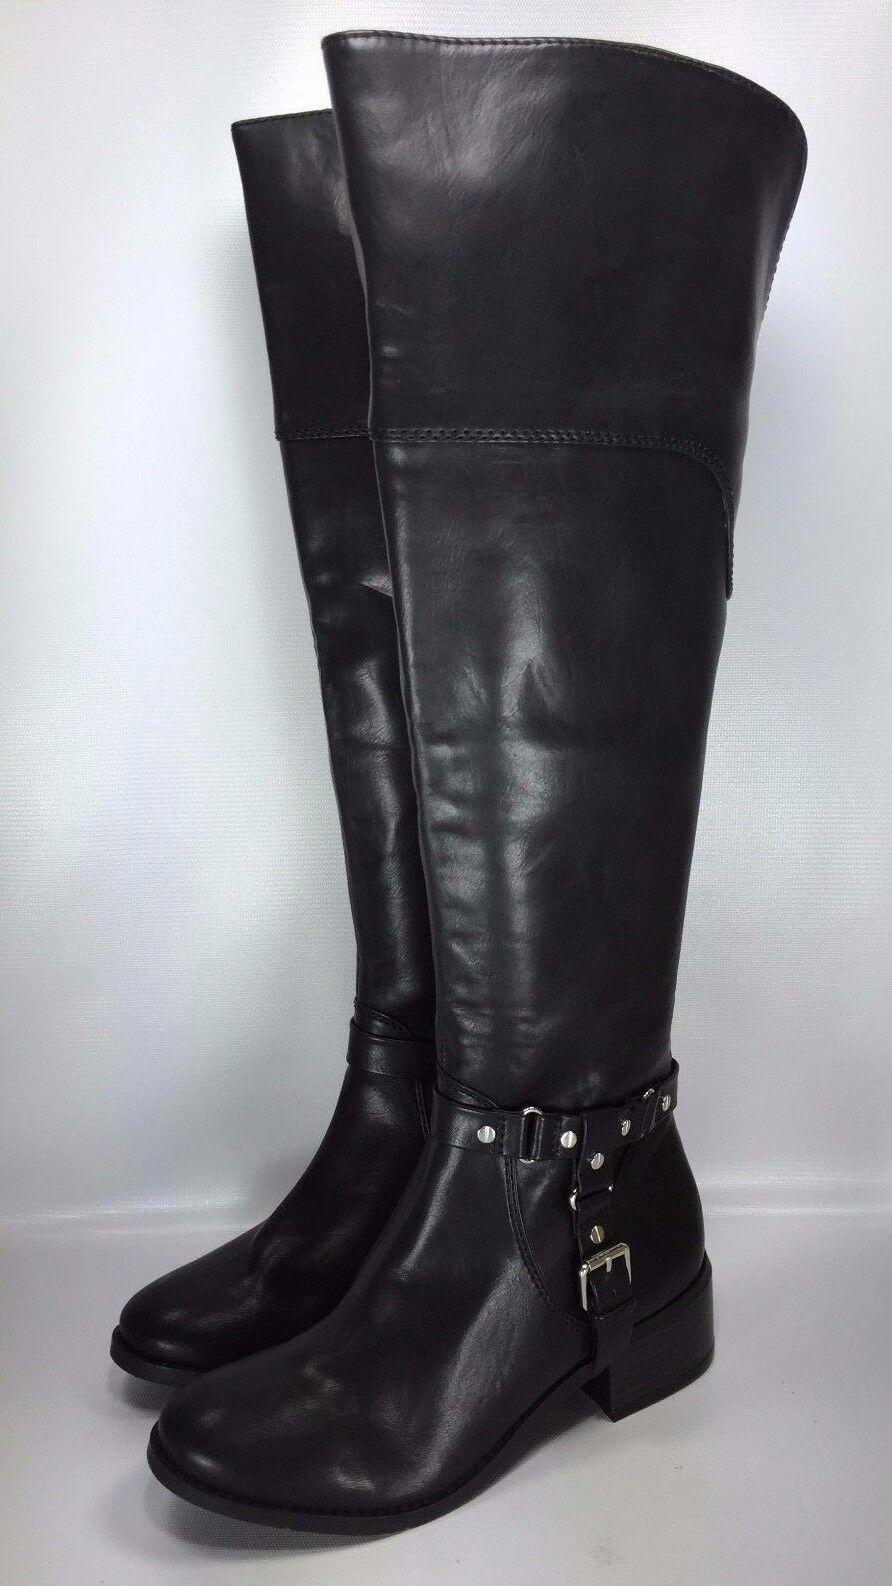 Dolce Vita Womens Black Coup Fashion Boots Shoe Size 7